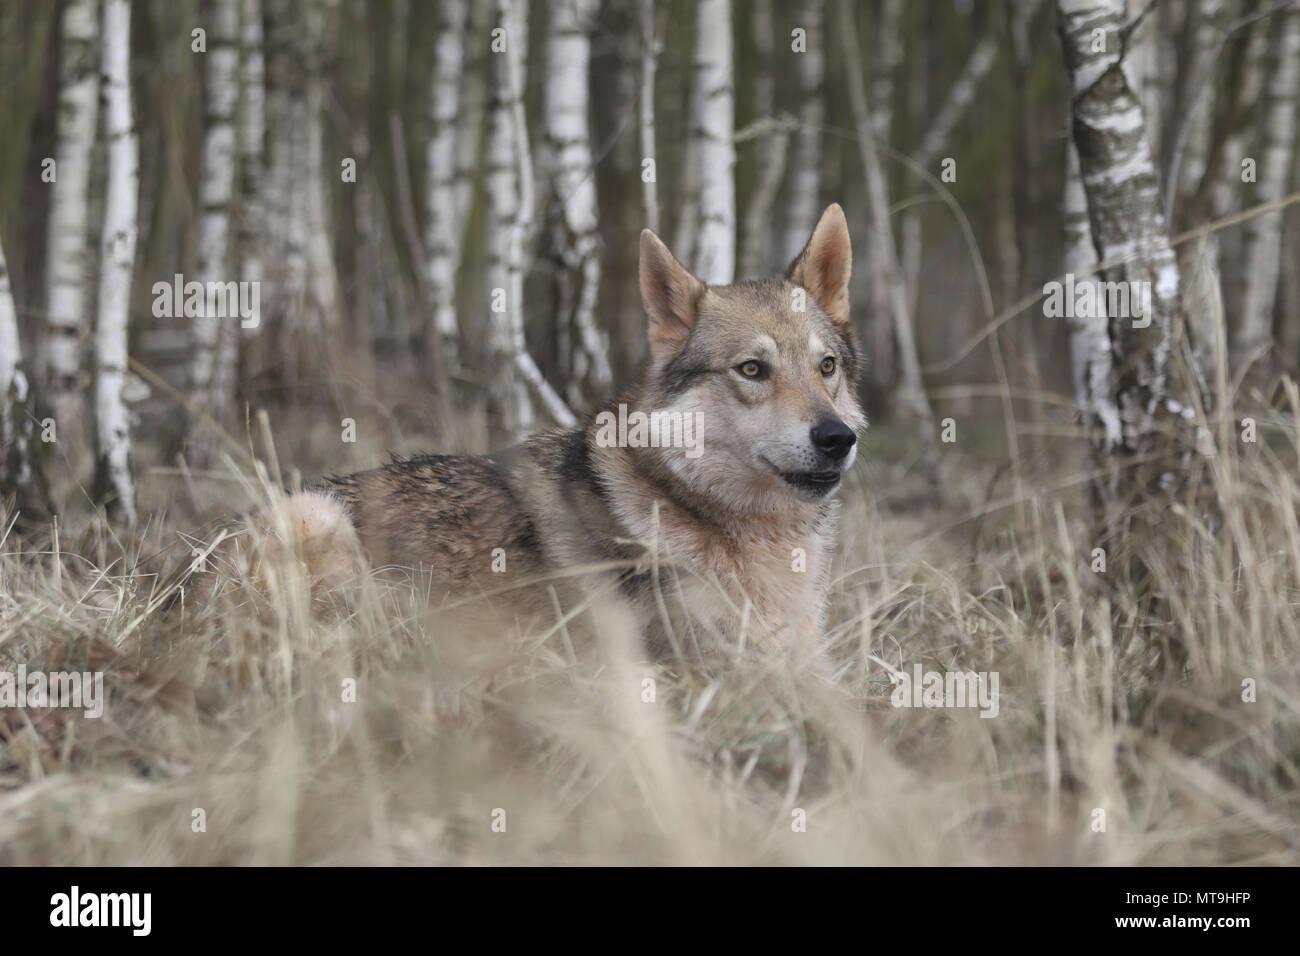 Czechoslovakian Wolfdog. Adult dog lying in a Birch forest. Germany - Stock Image